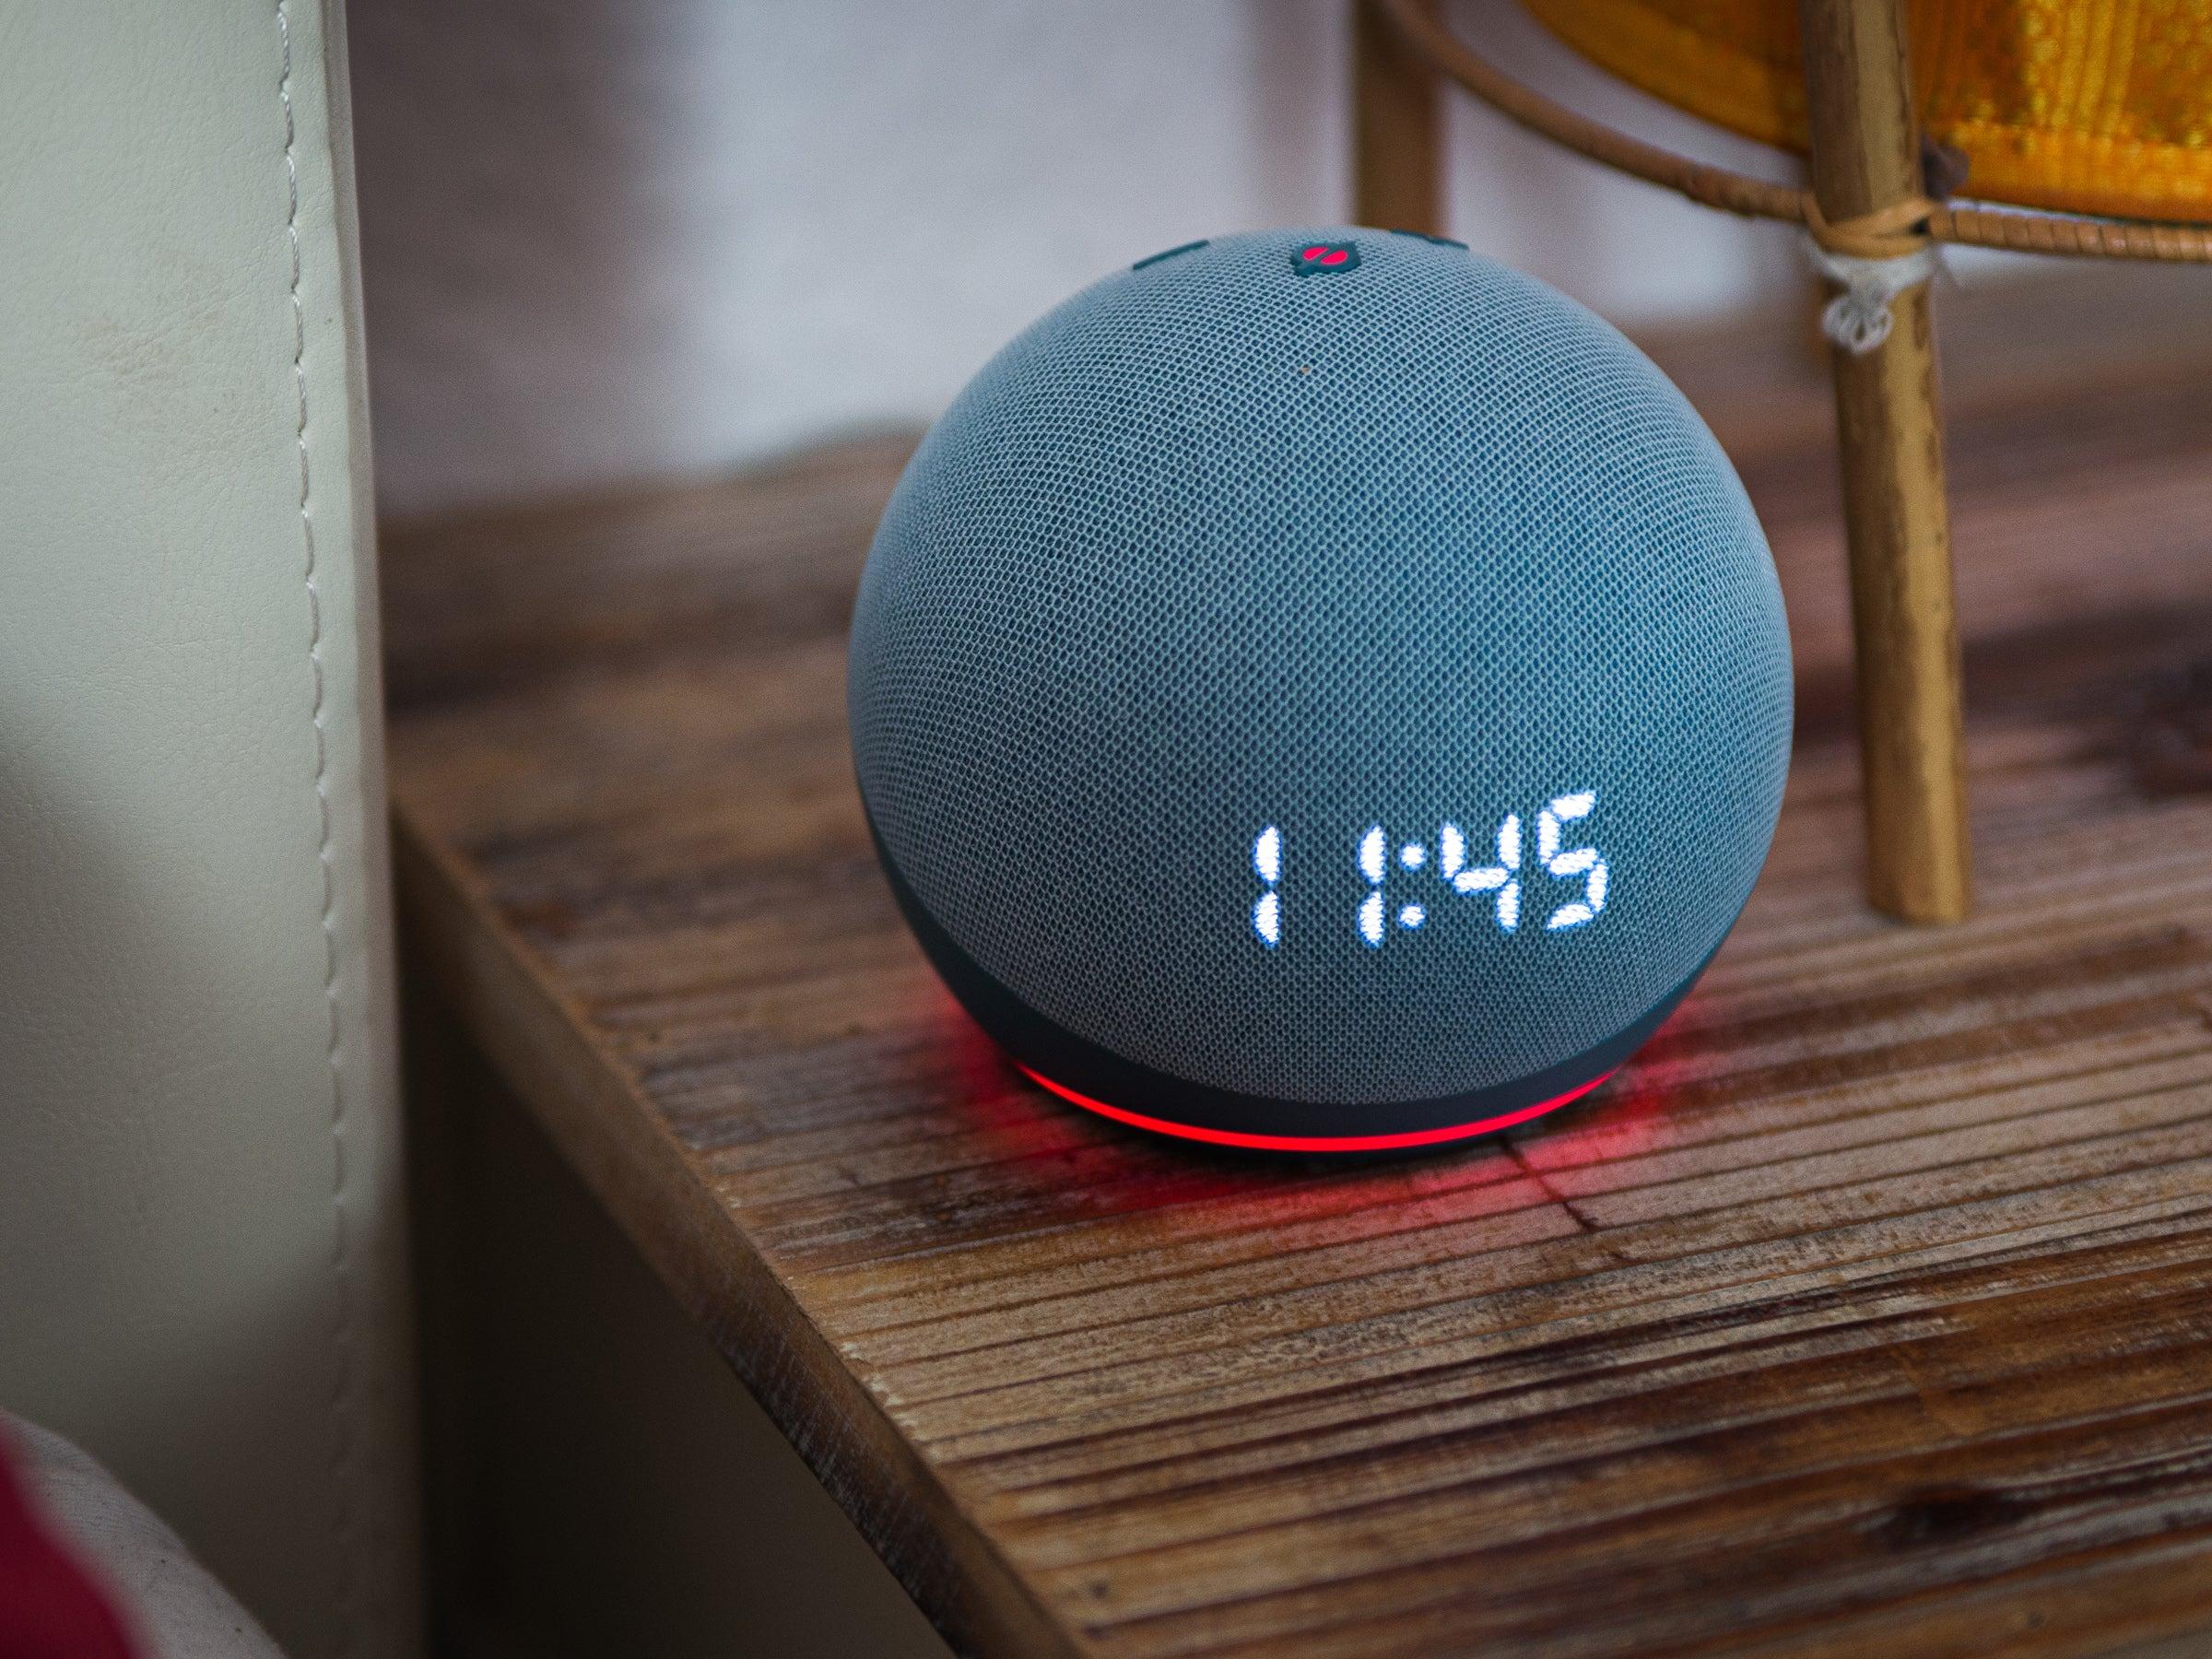 Smart Speaker im Vergleich: Amazon vs. Google vs. Apple